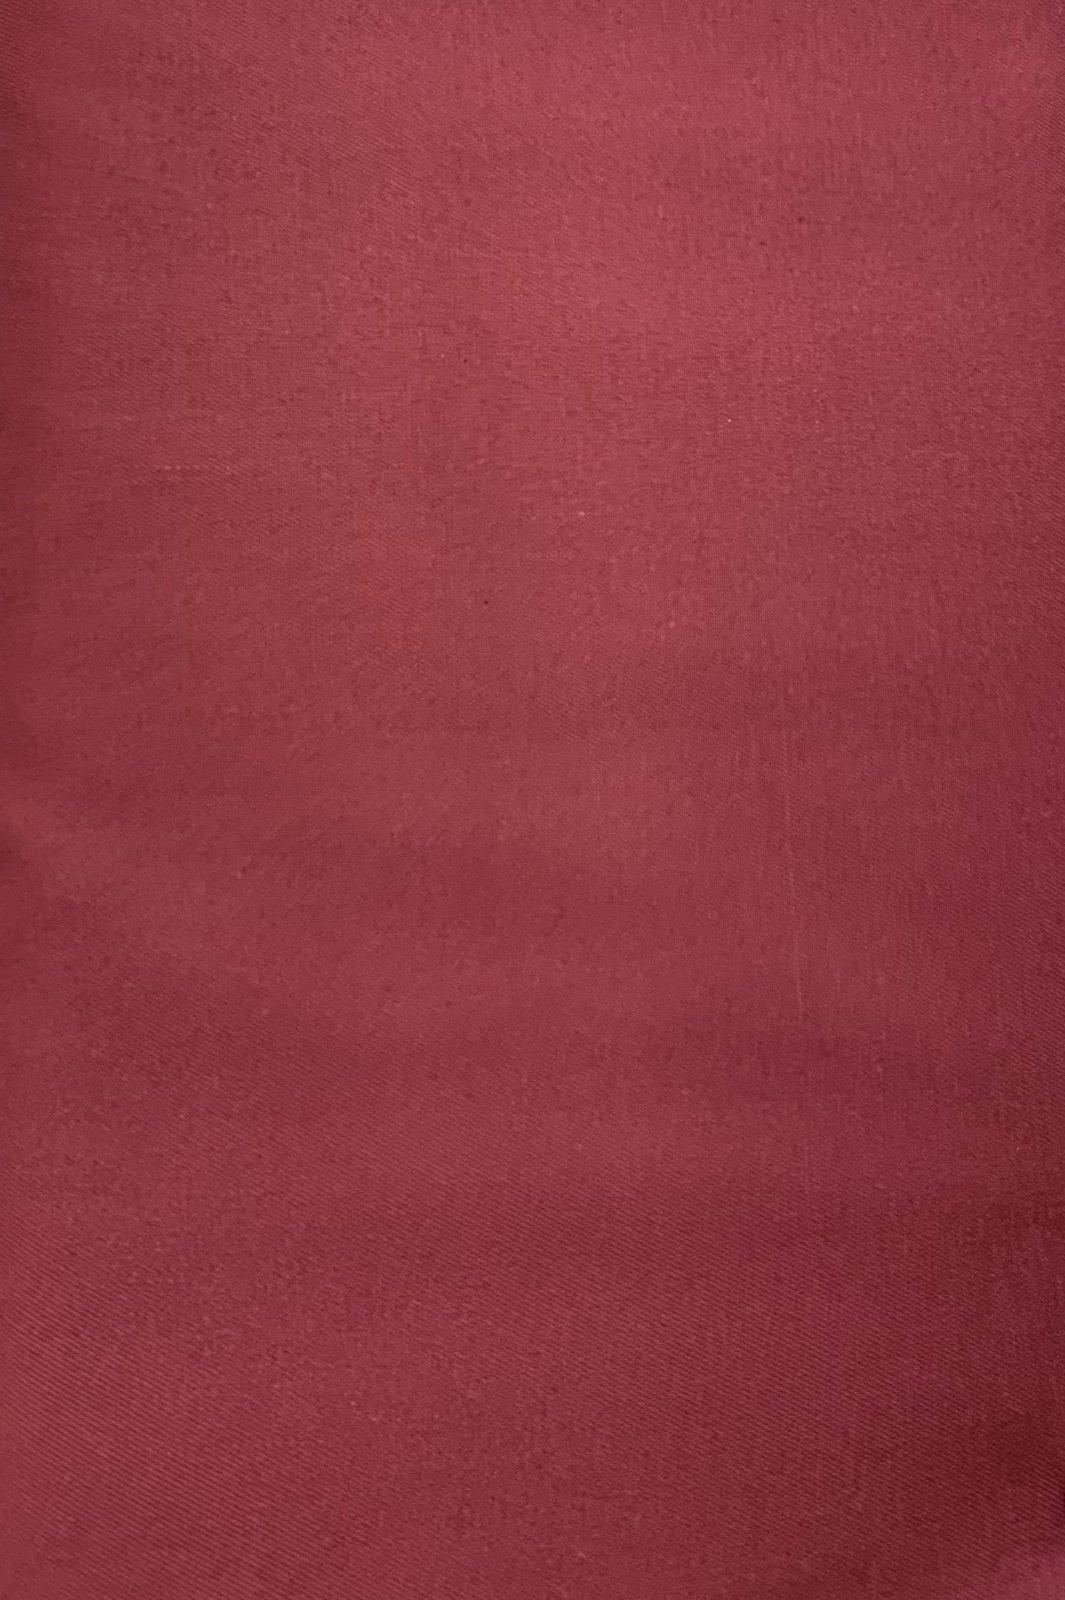 Maroon/Crimson Twill